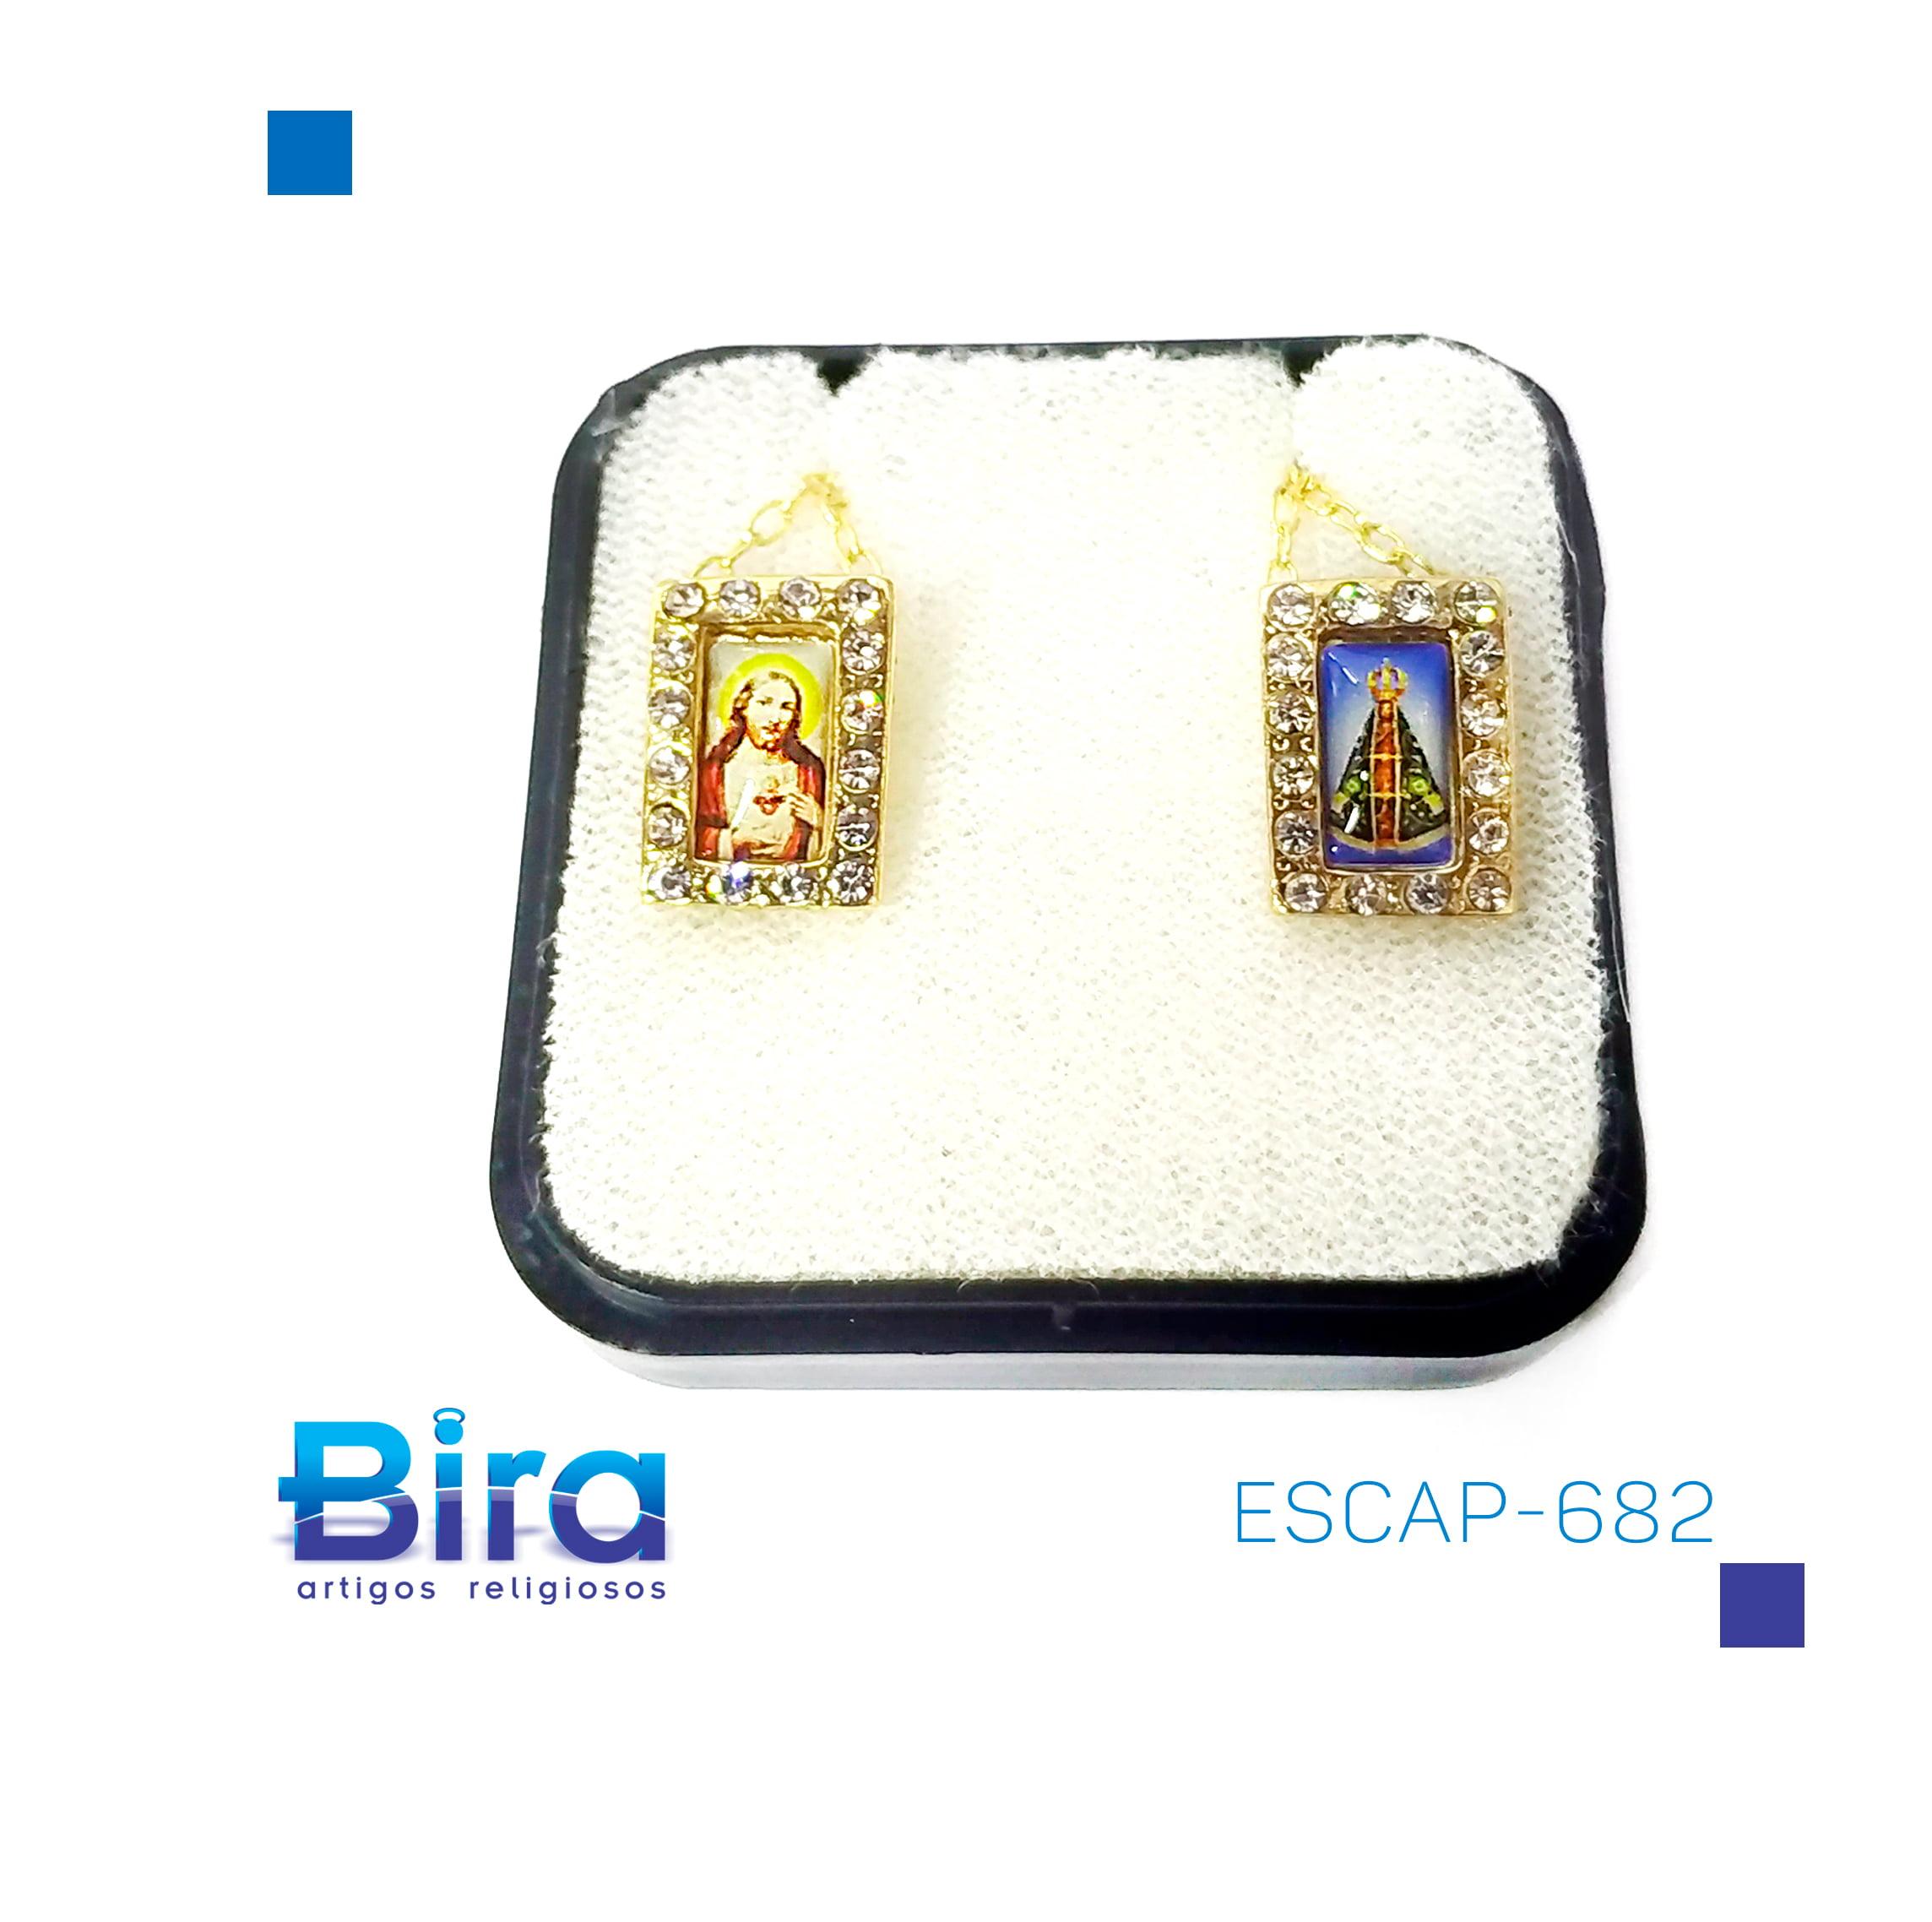 Bira Artigos Religiosos - ESCAPULARIO FOLHEADO A OURO STRASS - Cód ESCAP-682